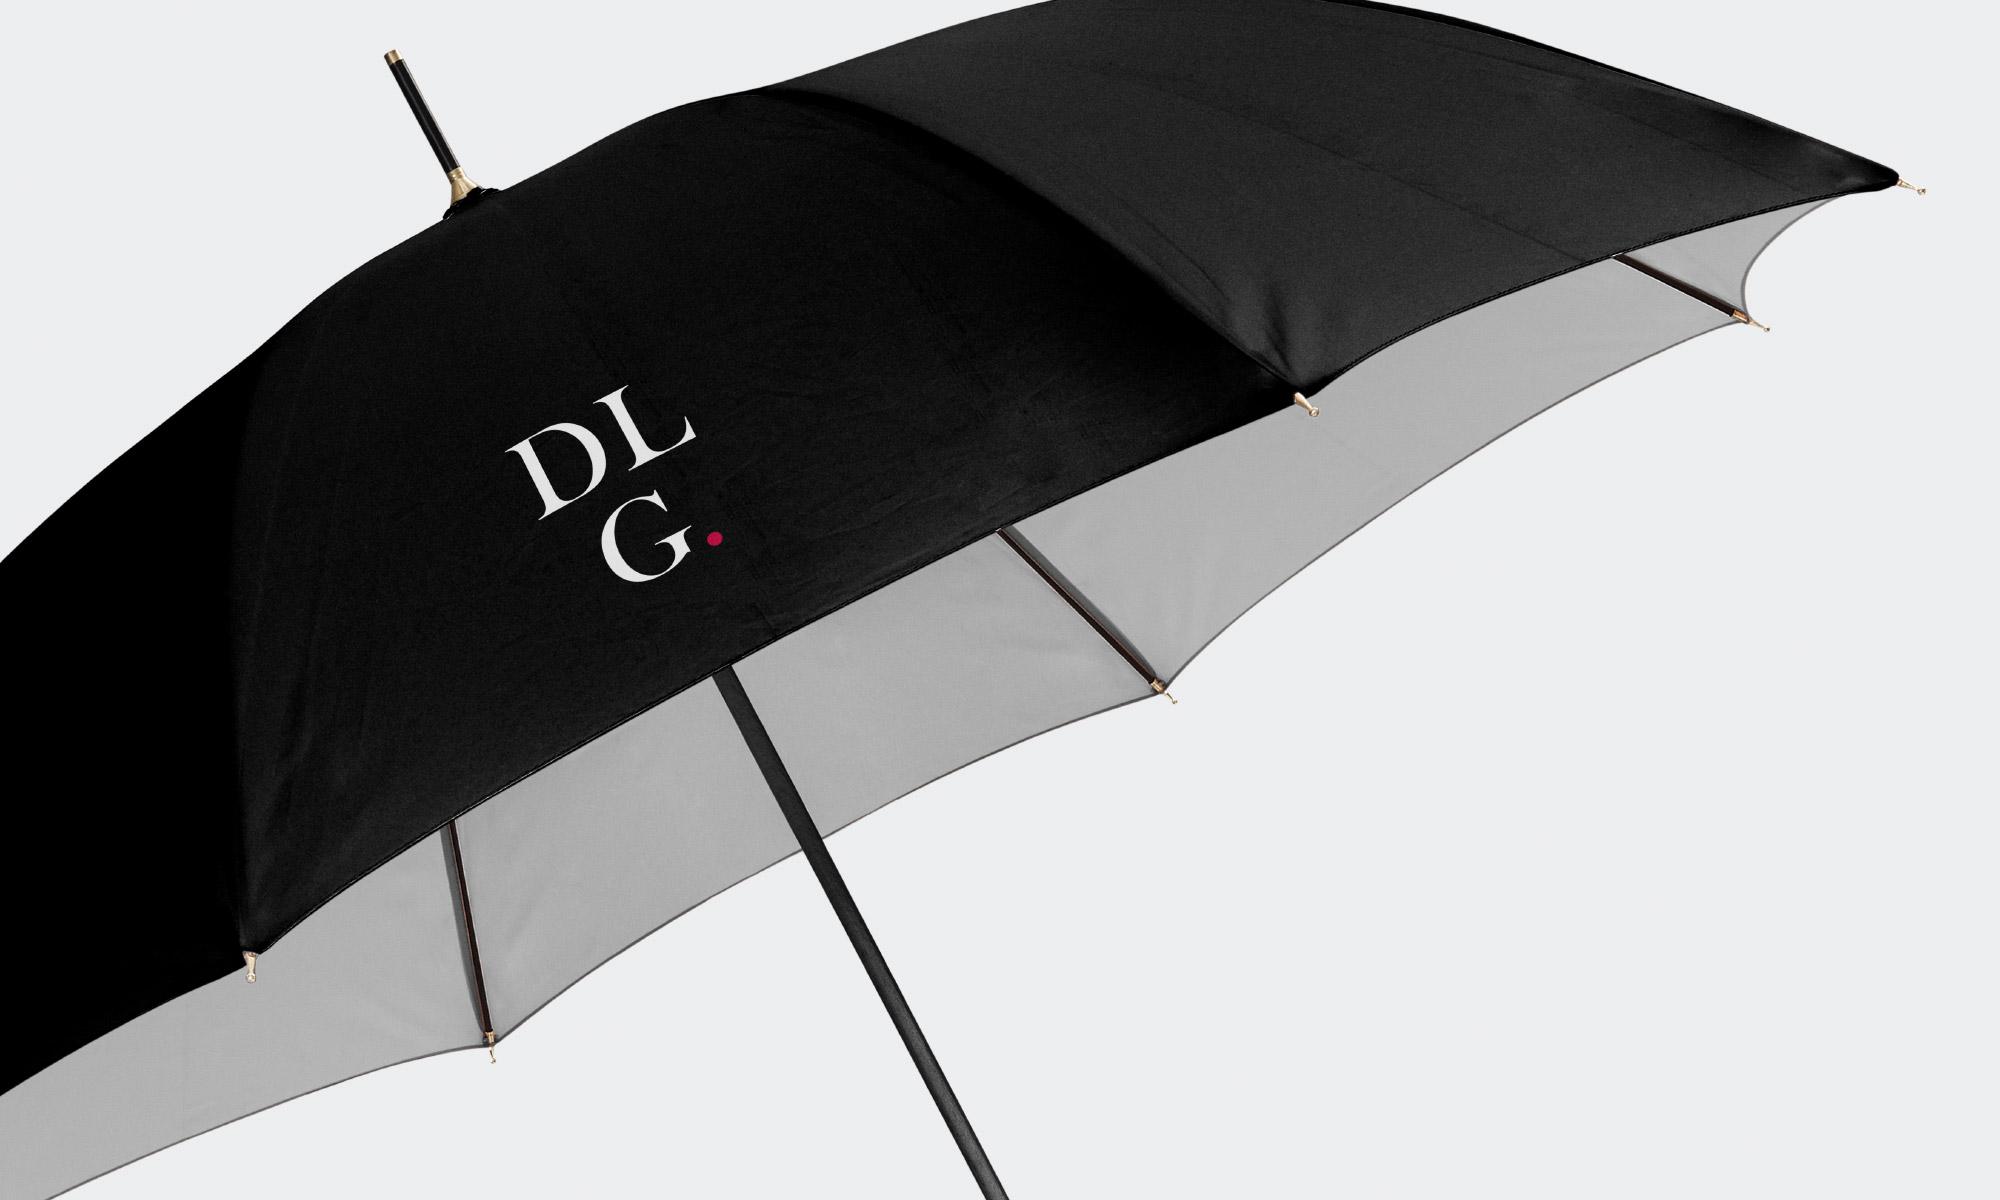 Digital Luxury Group logo